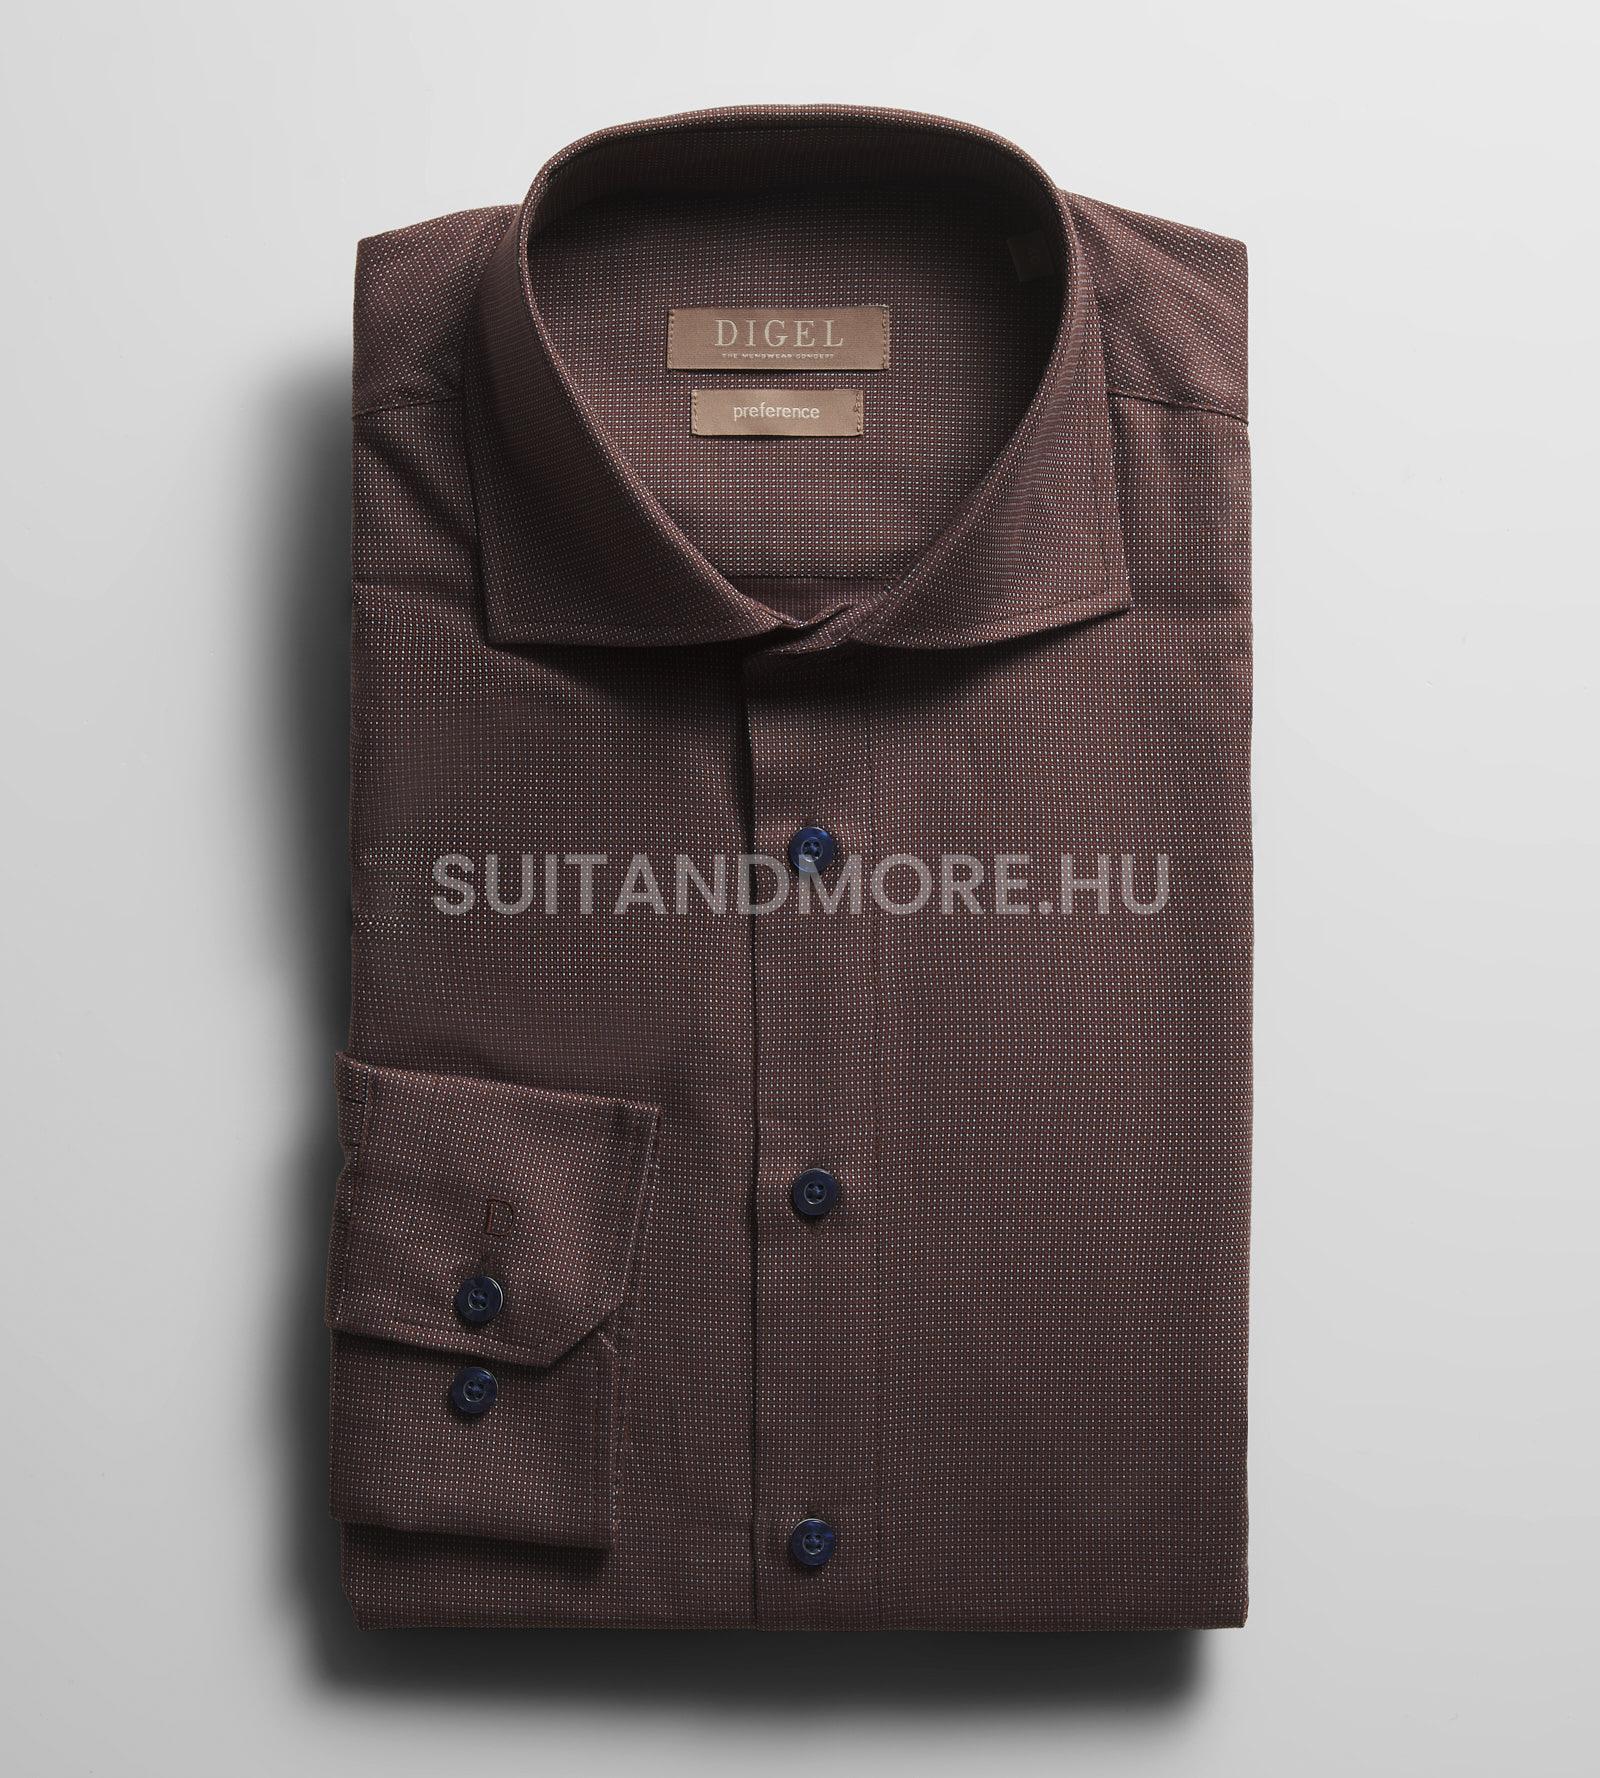 digel-sotetbarna-modern-fit-tupettyes-ing-dantos1-1-1267019-30-01